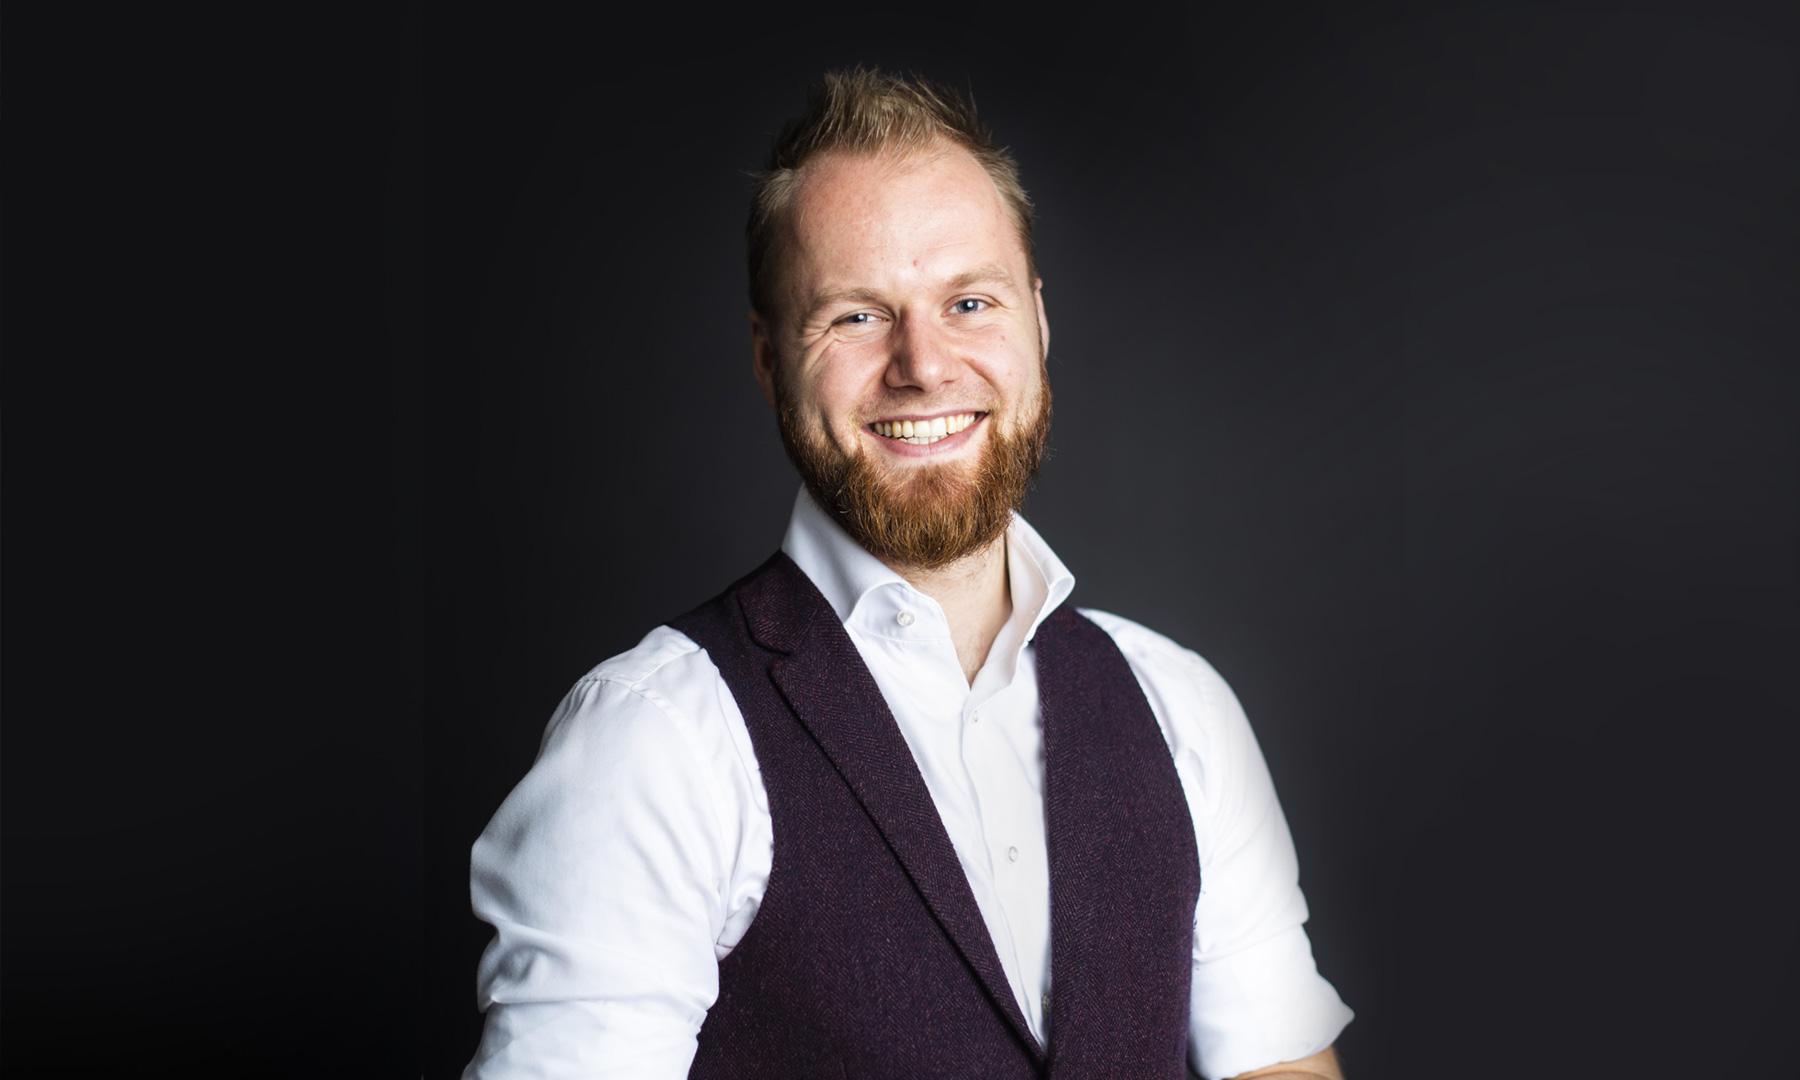 Gertjan Van Ginkel